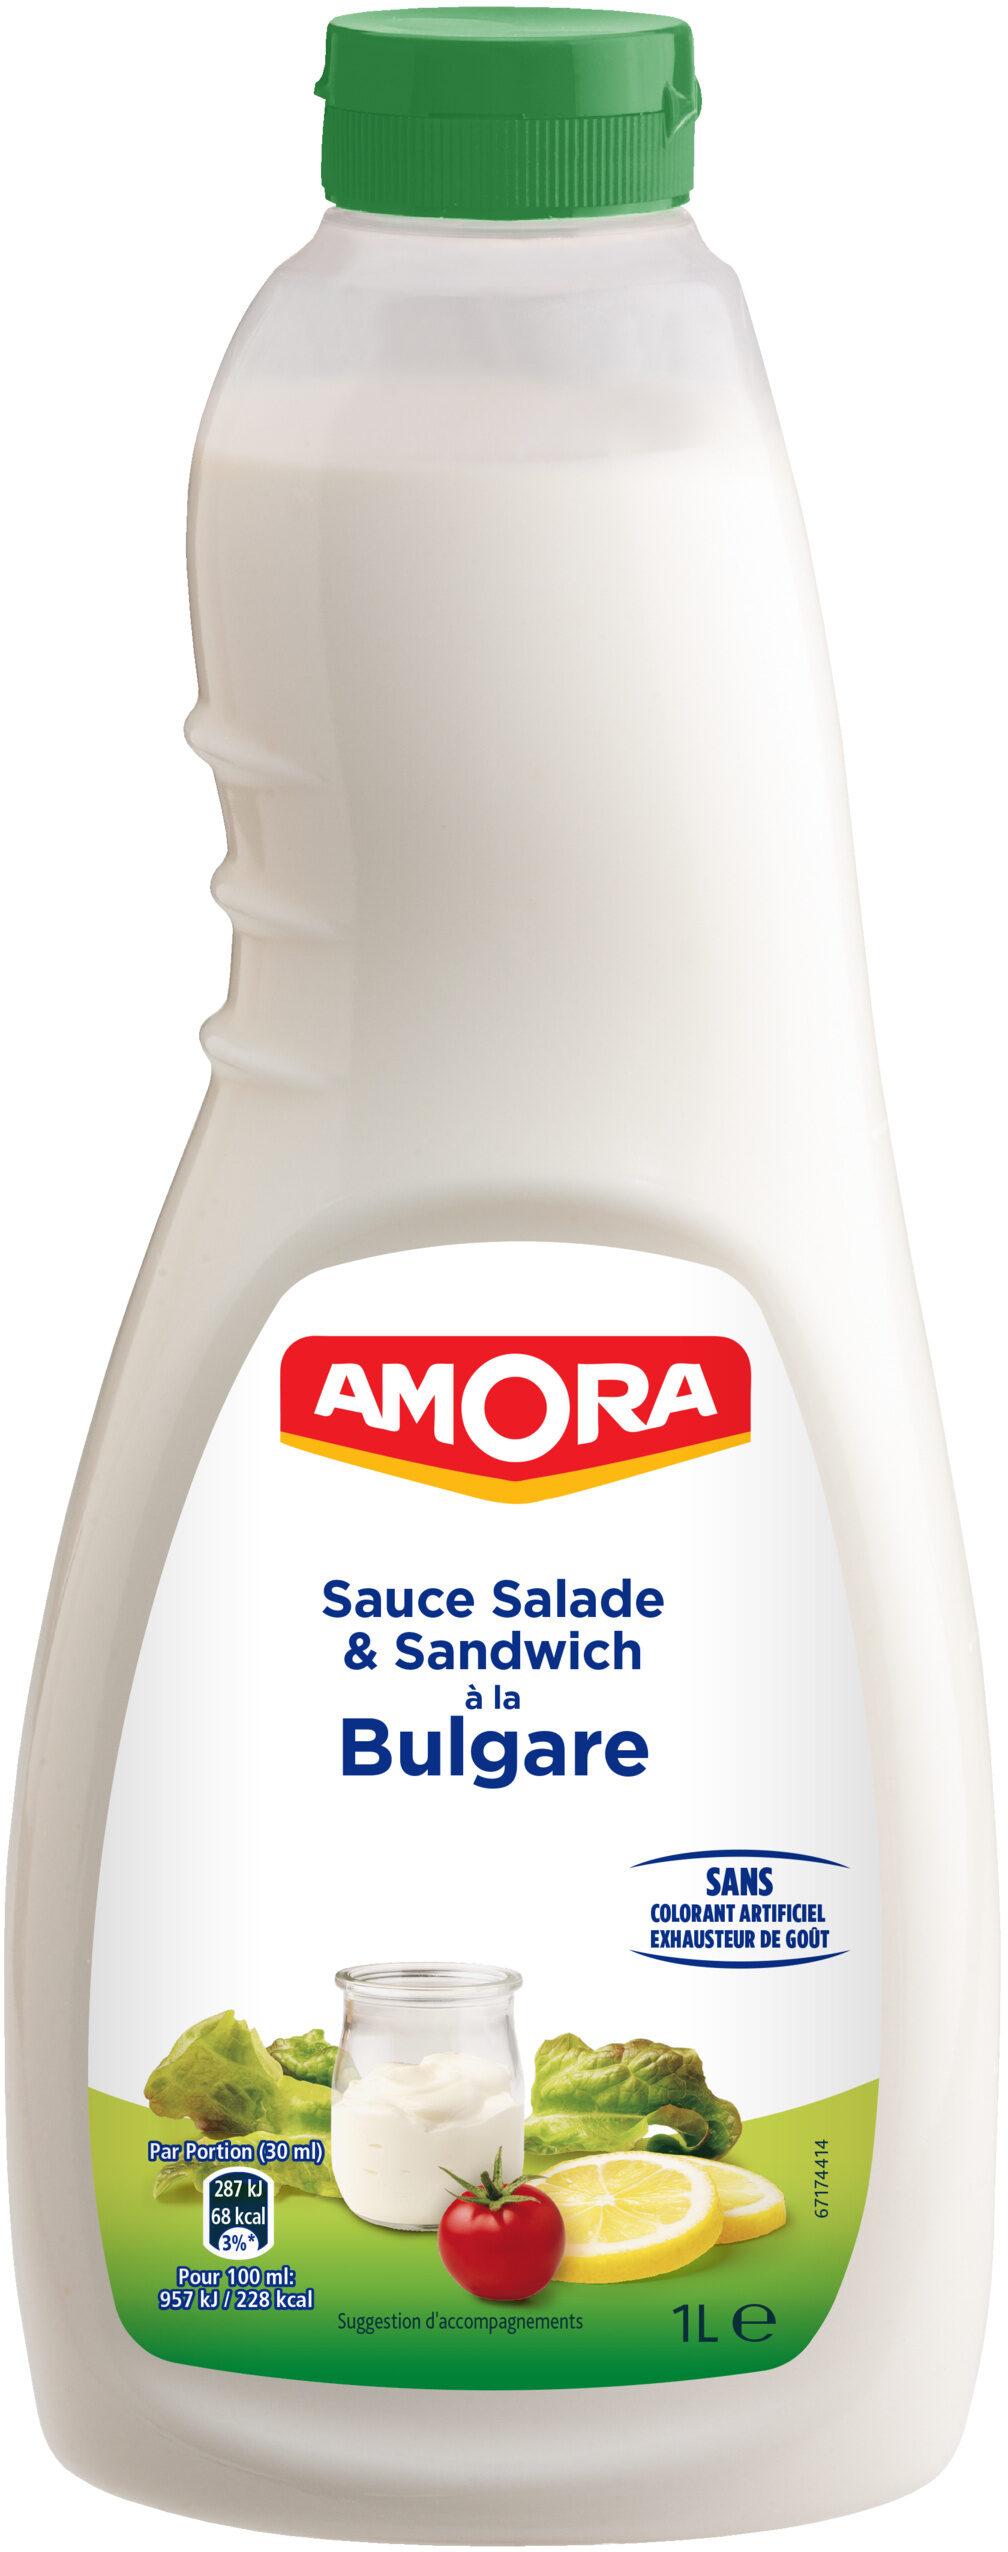 Amora Sauce Bulgare salade & sandwich bouteille - Produit - fr